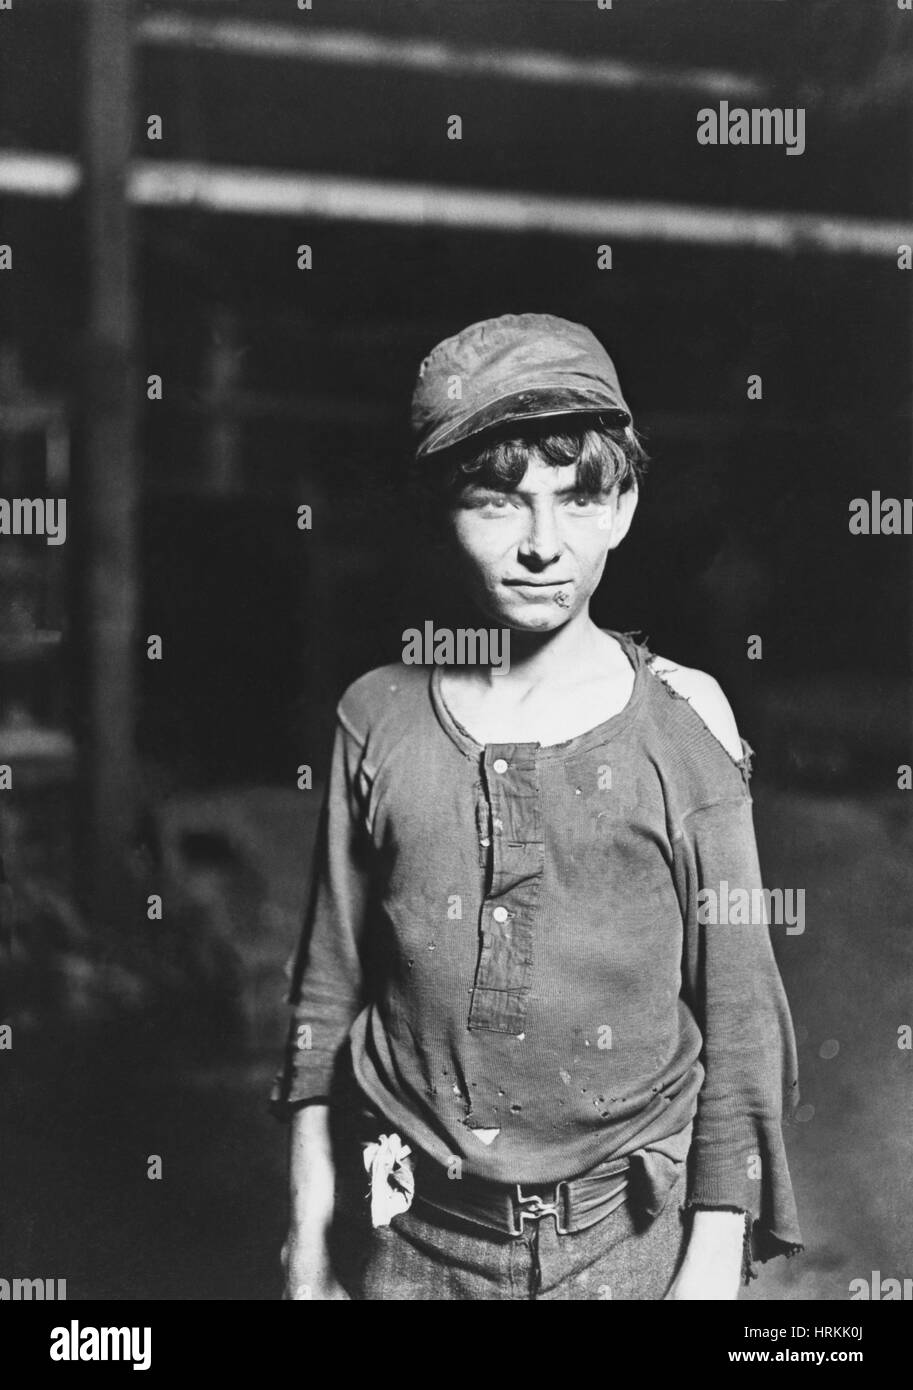 Glass Works Boy, Lewis Hine, 1908 - Stock Image